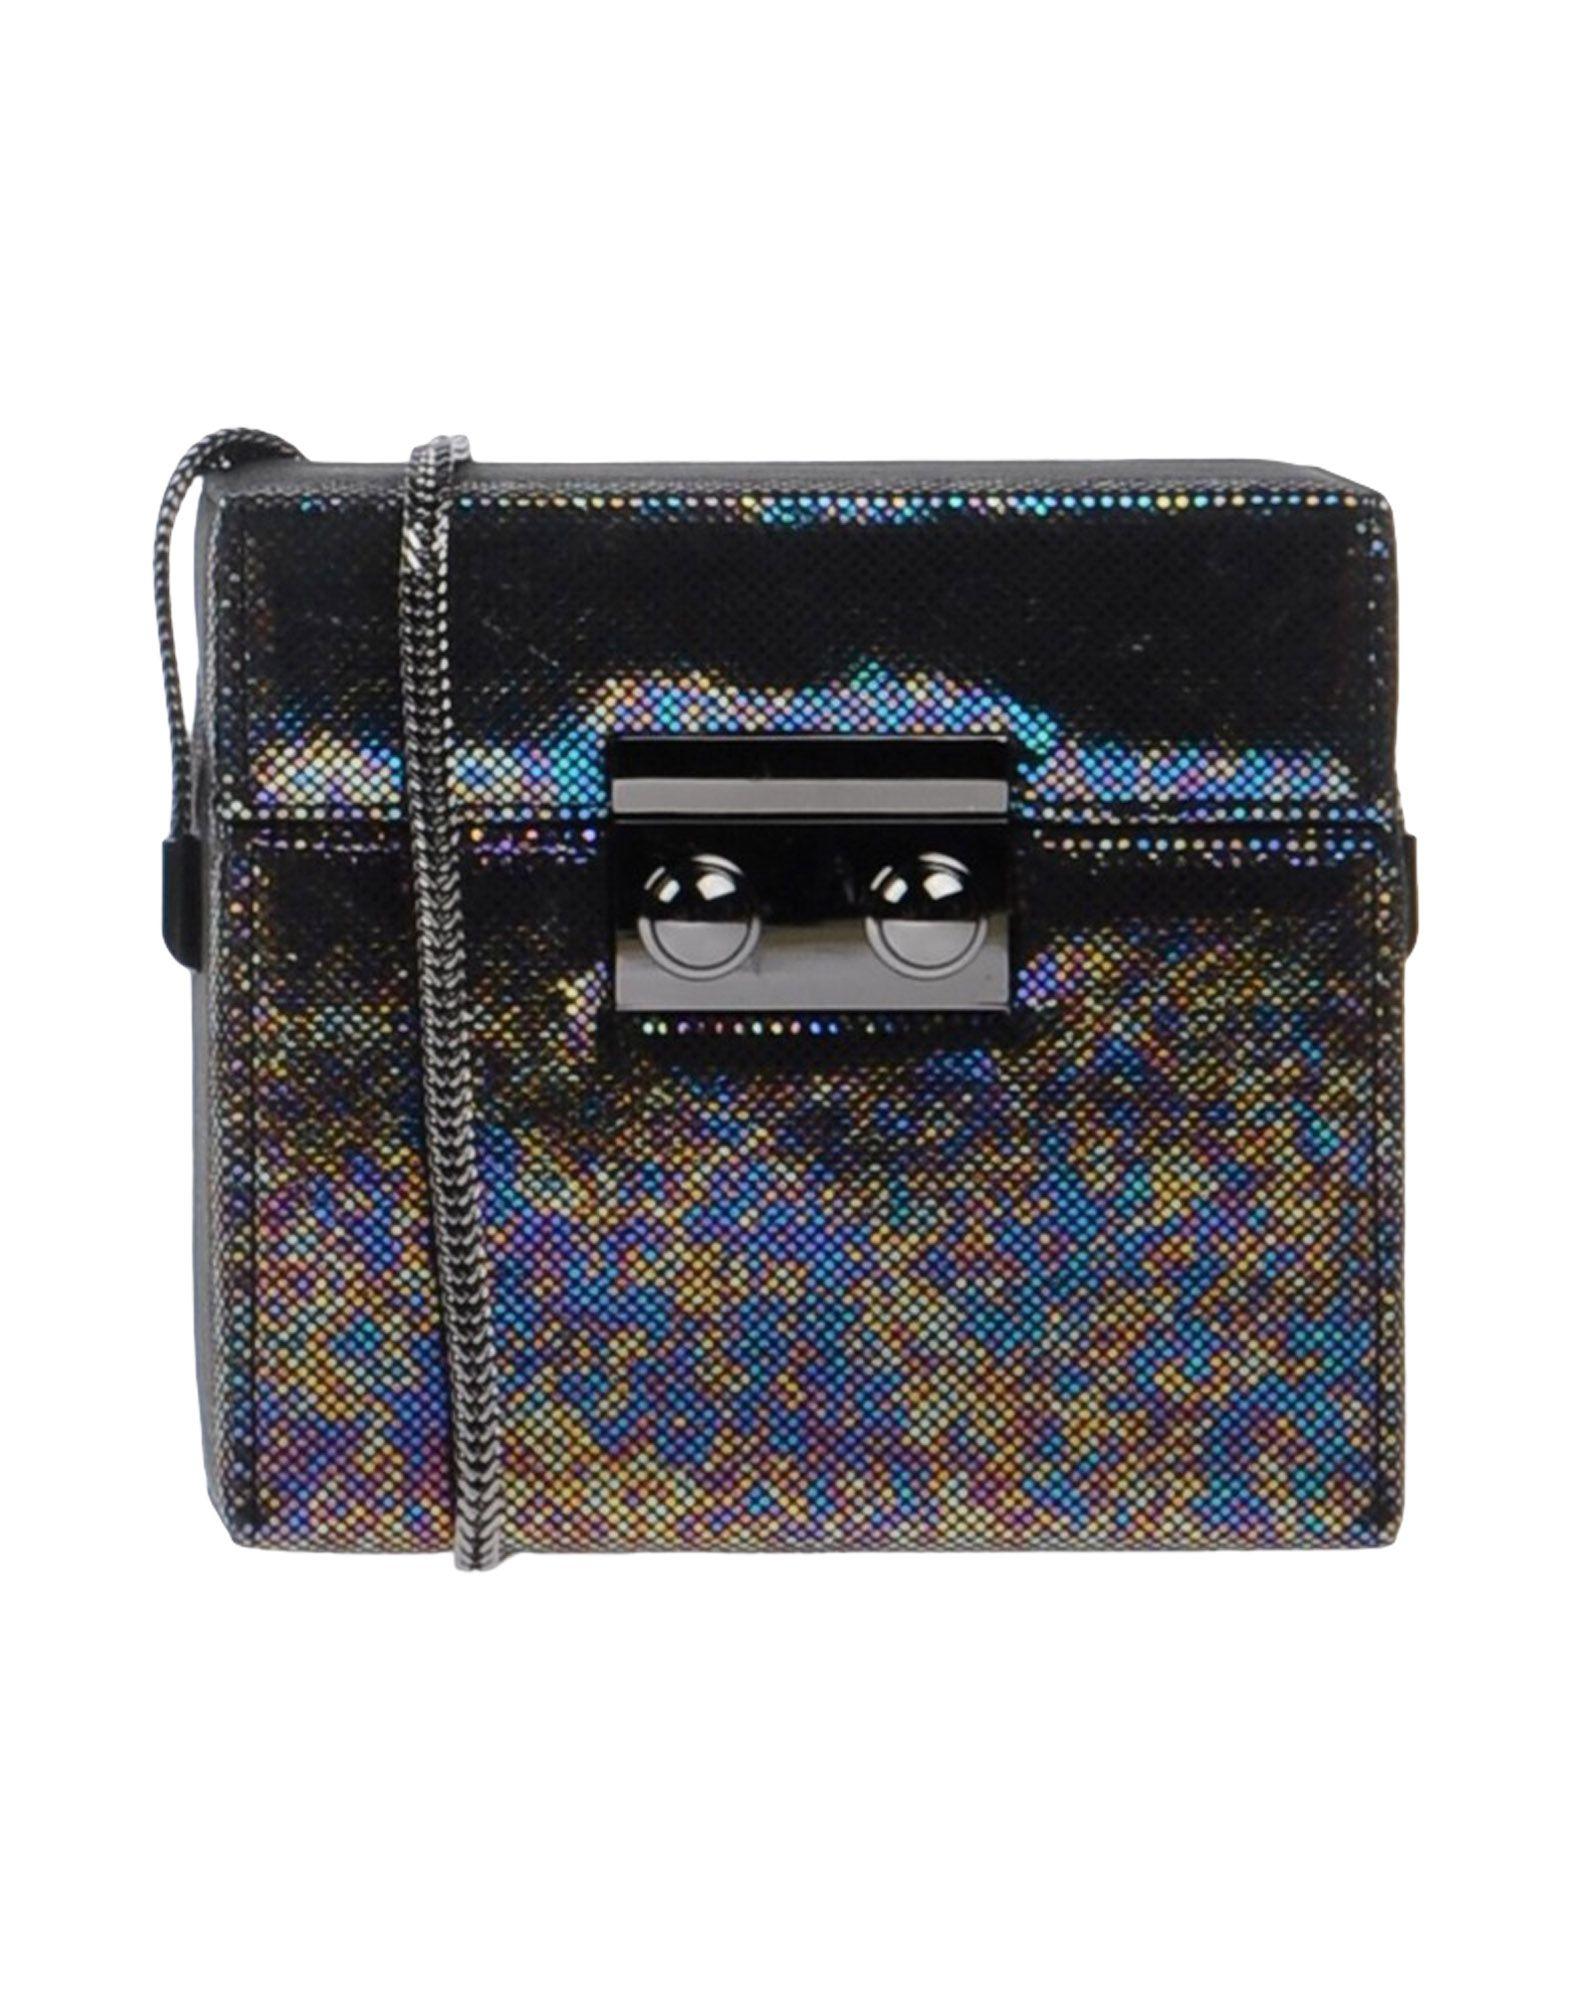 Steve Madden Across Body Bag Women Bags Online On Yoox United States 45332985mg